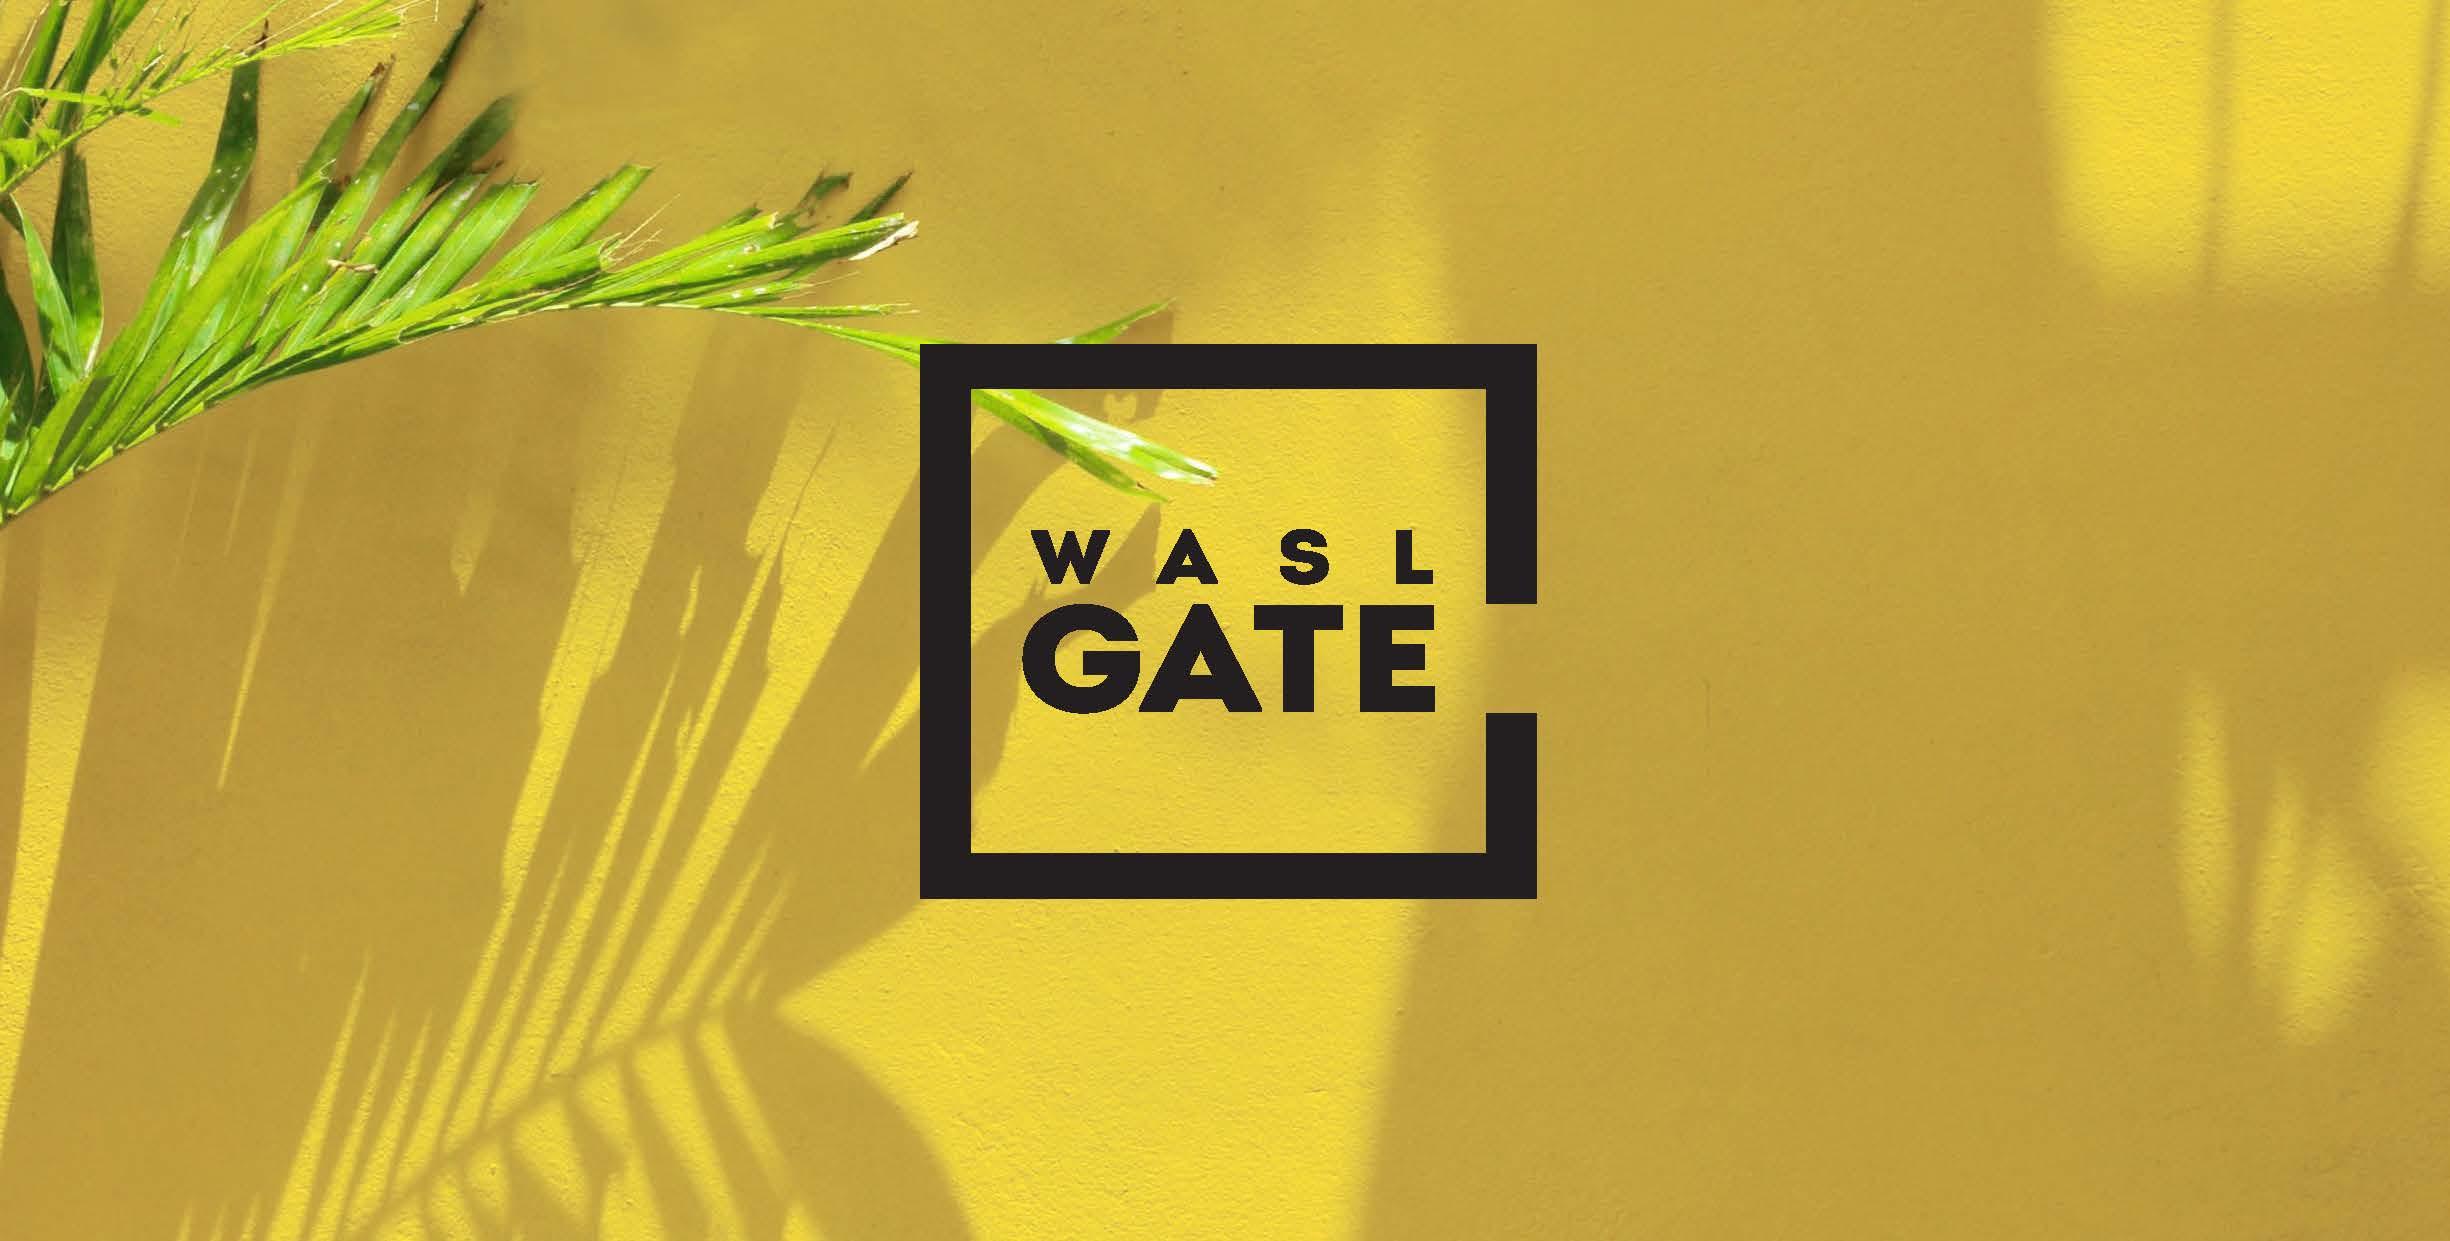 0.1.WaslGate_Logo_v5 copy_Page_05.jpg